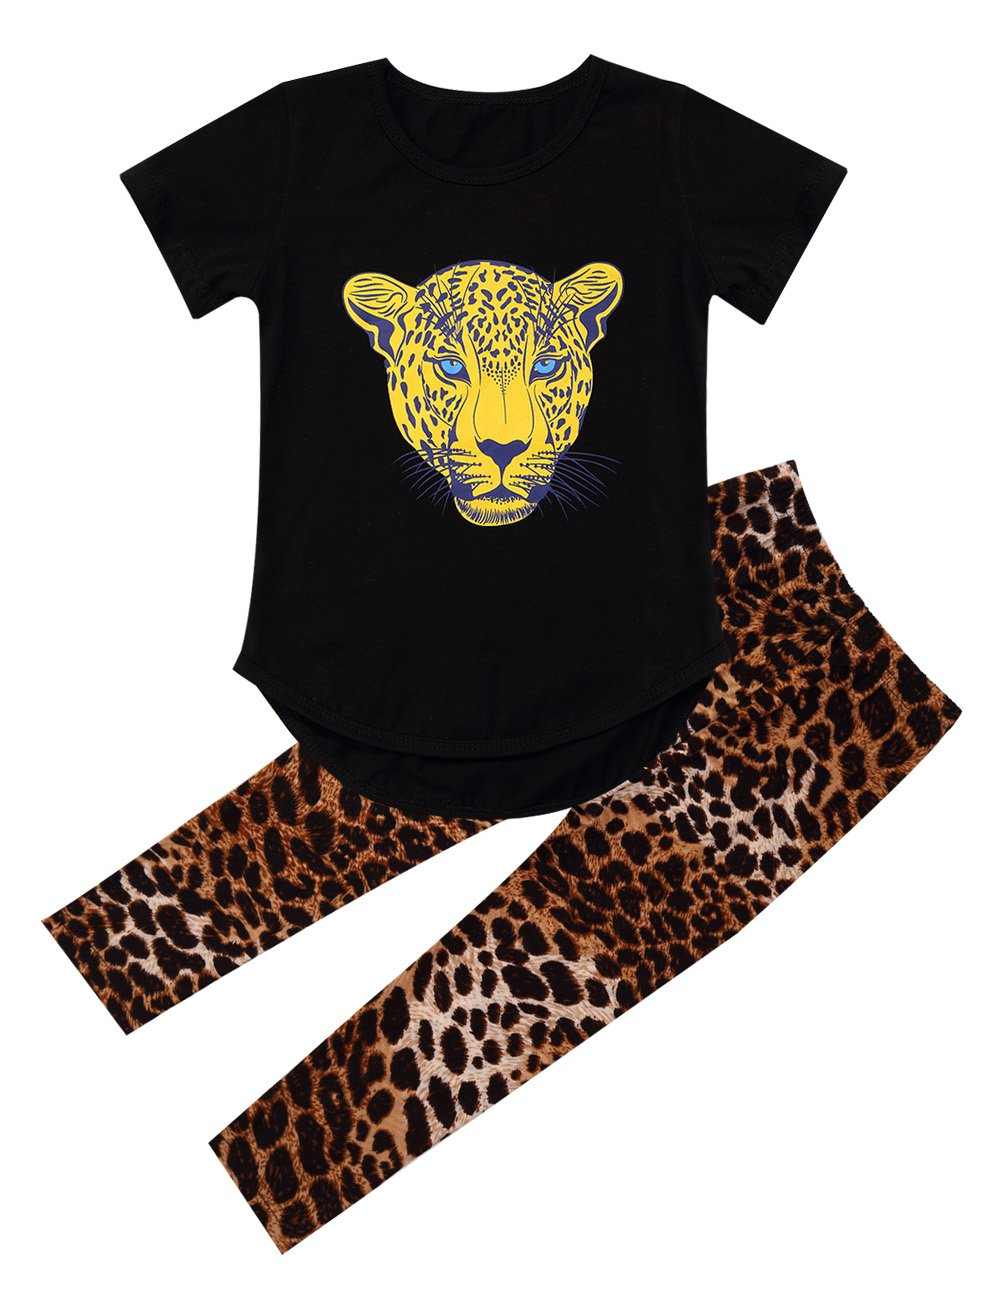 Kidlove Leopard Head Girls Pajama Set Outfit (2-4T, Short-Black)